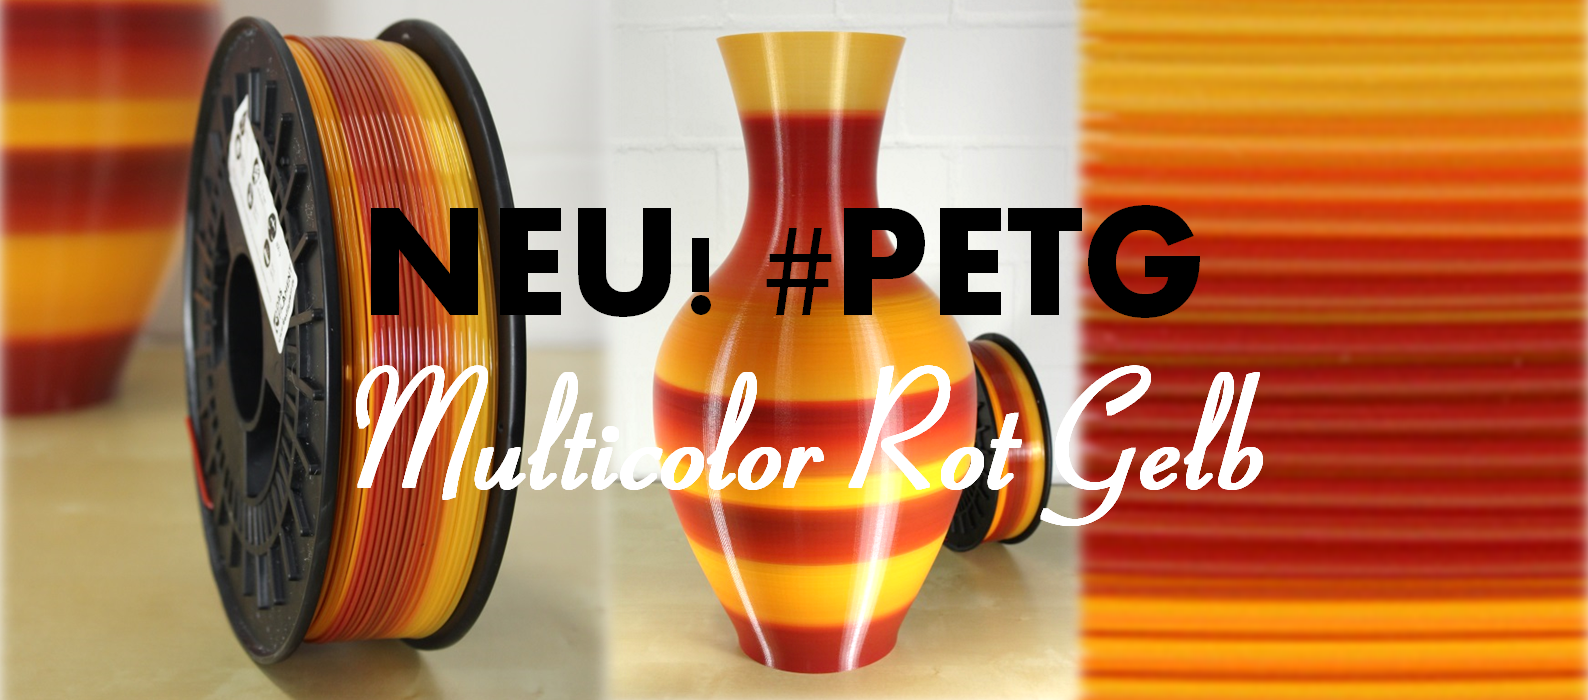 Neu! PETG Multicolor Rot-Gelb